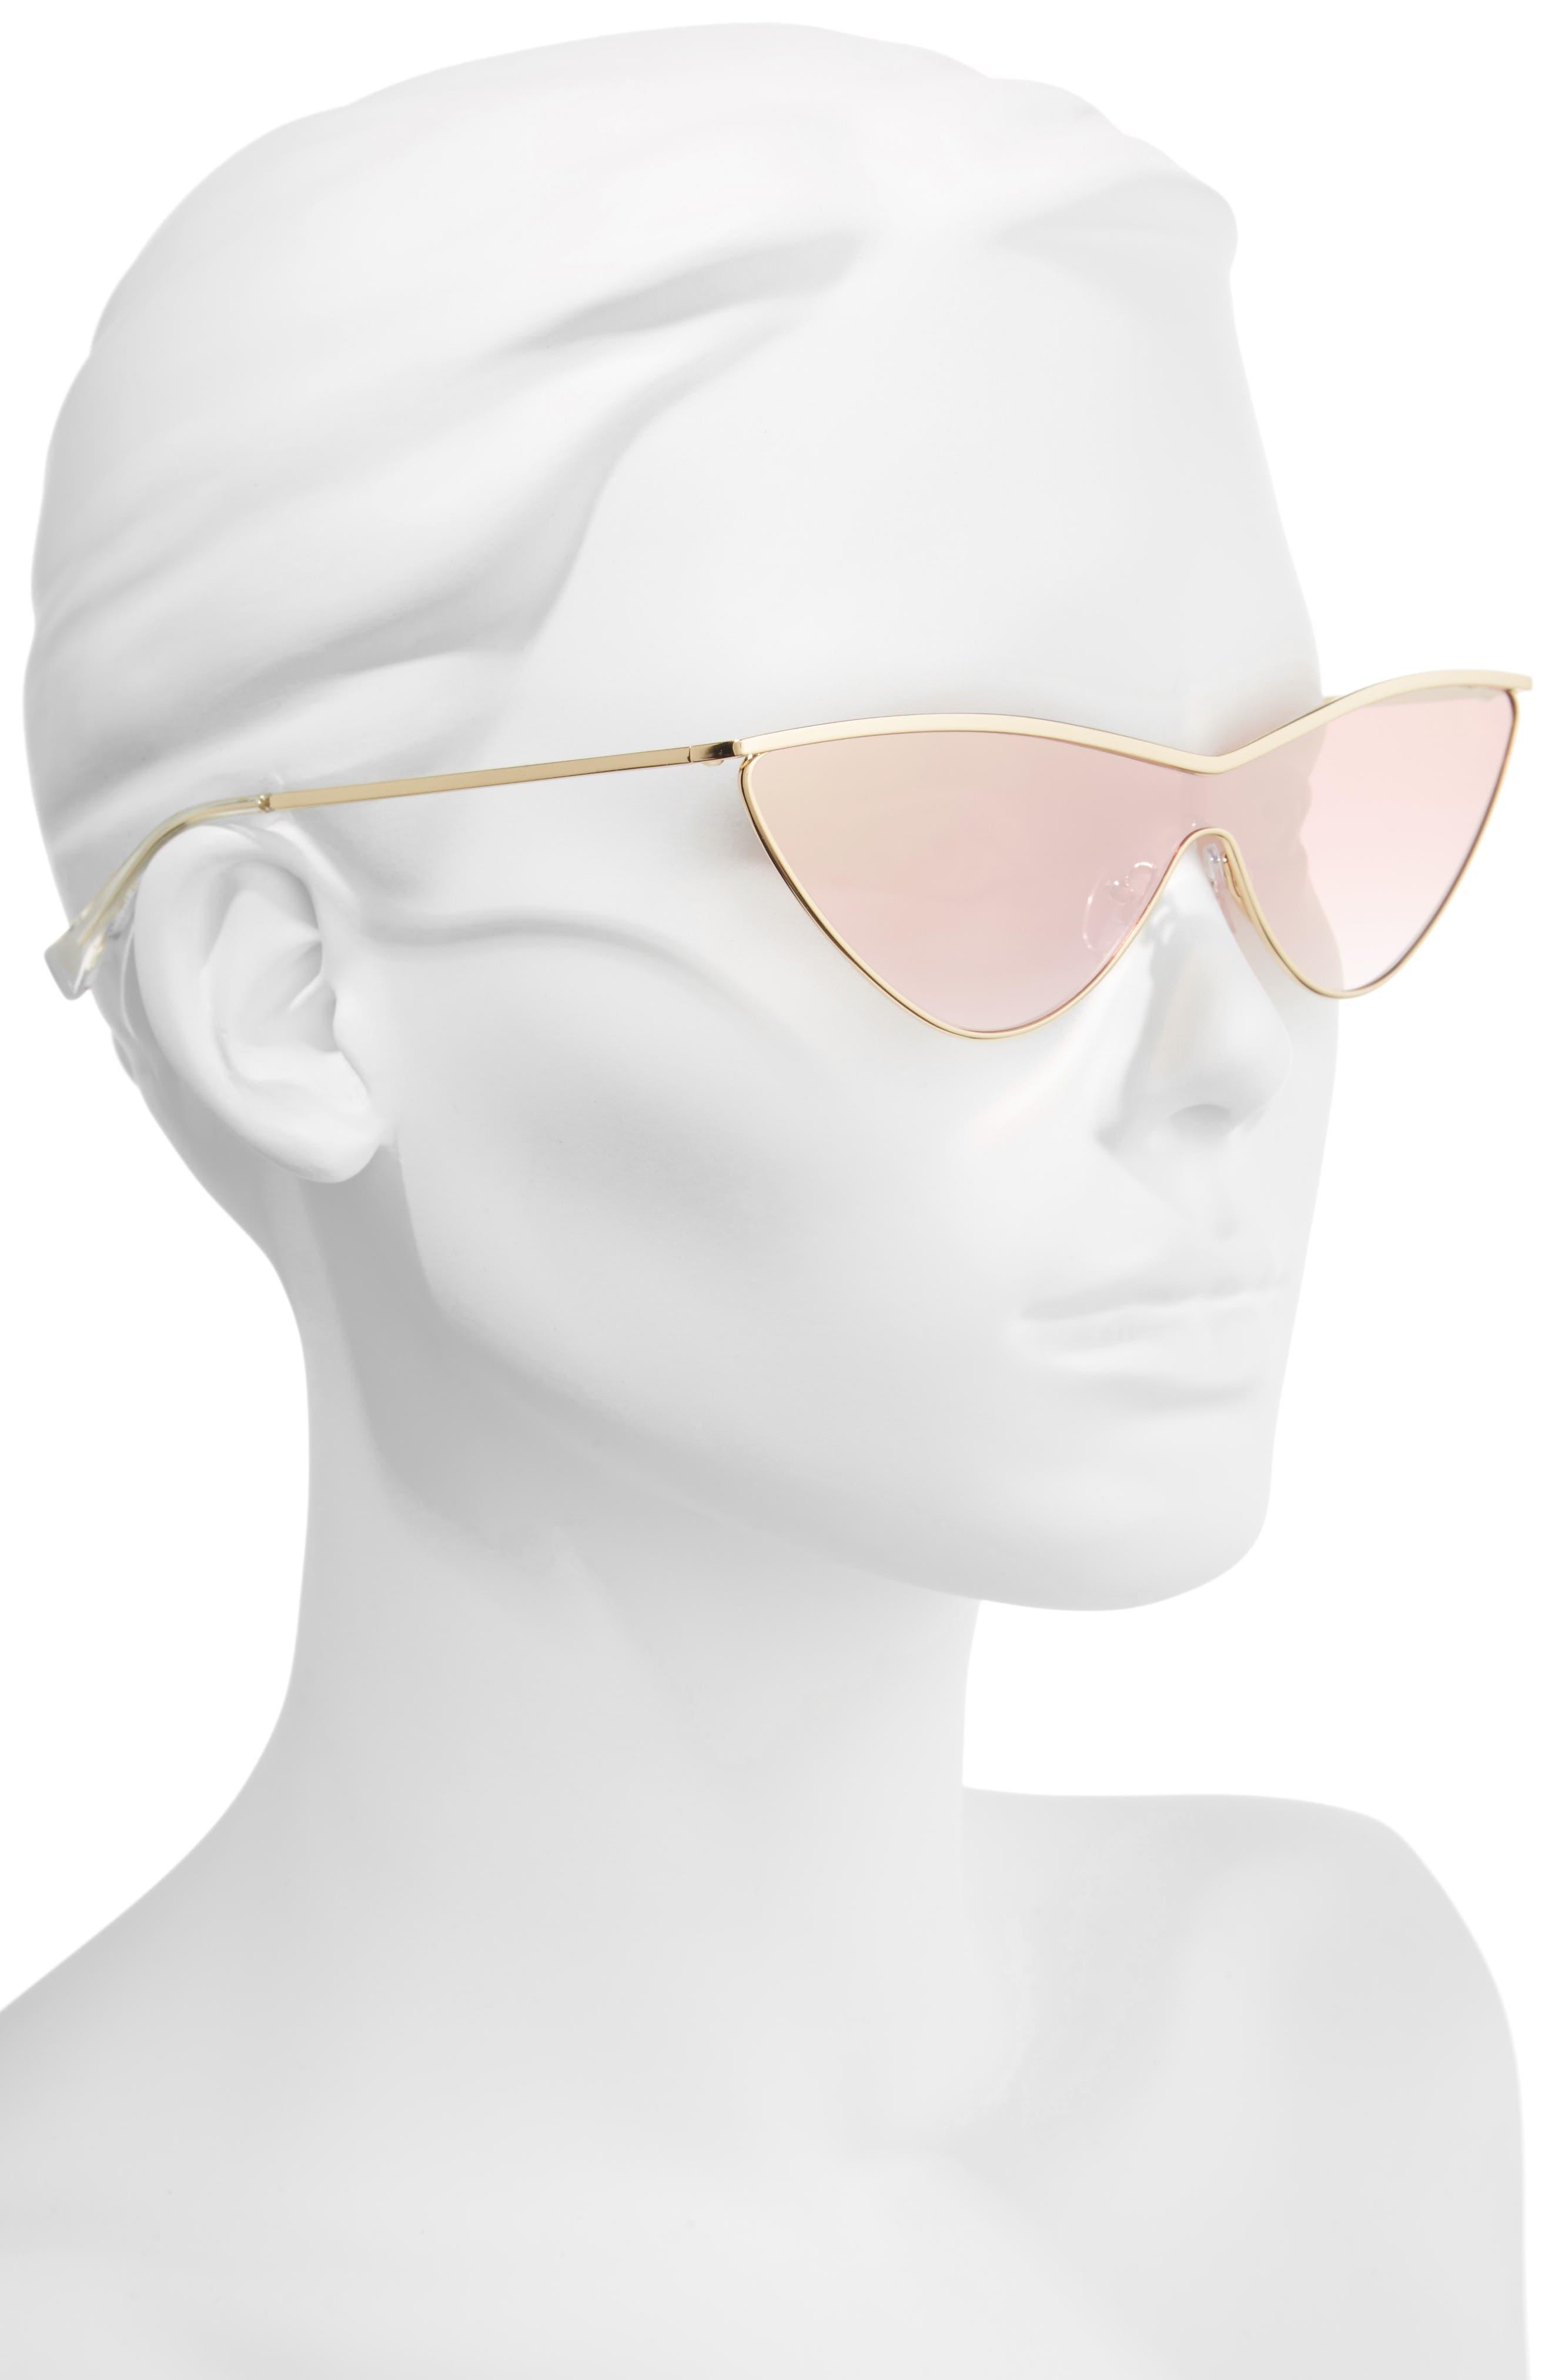 Alternate Image 2  - Adam Selman x Le Specs Luxe The Fugitive 71mm Sunglasses